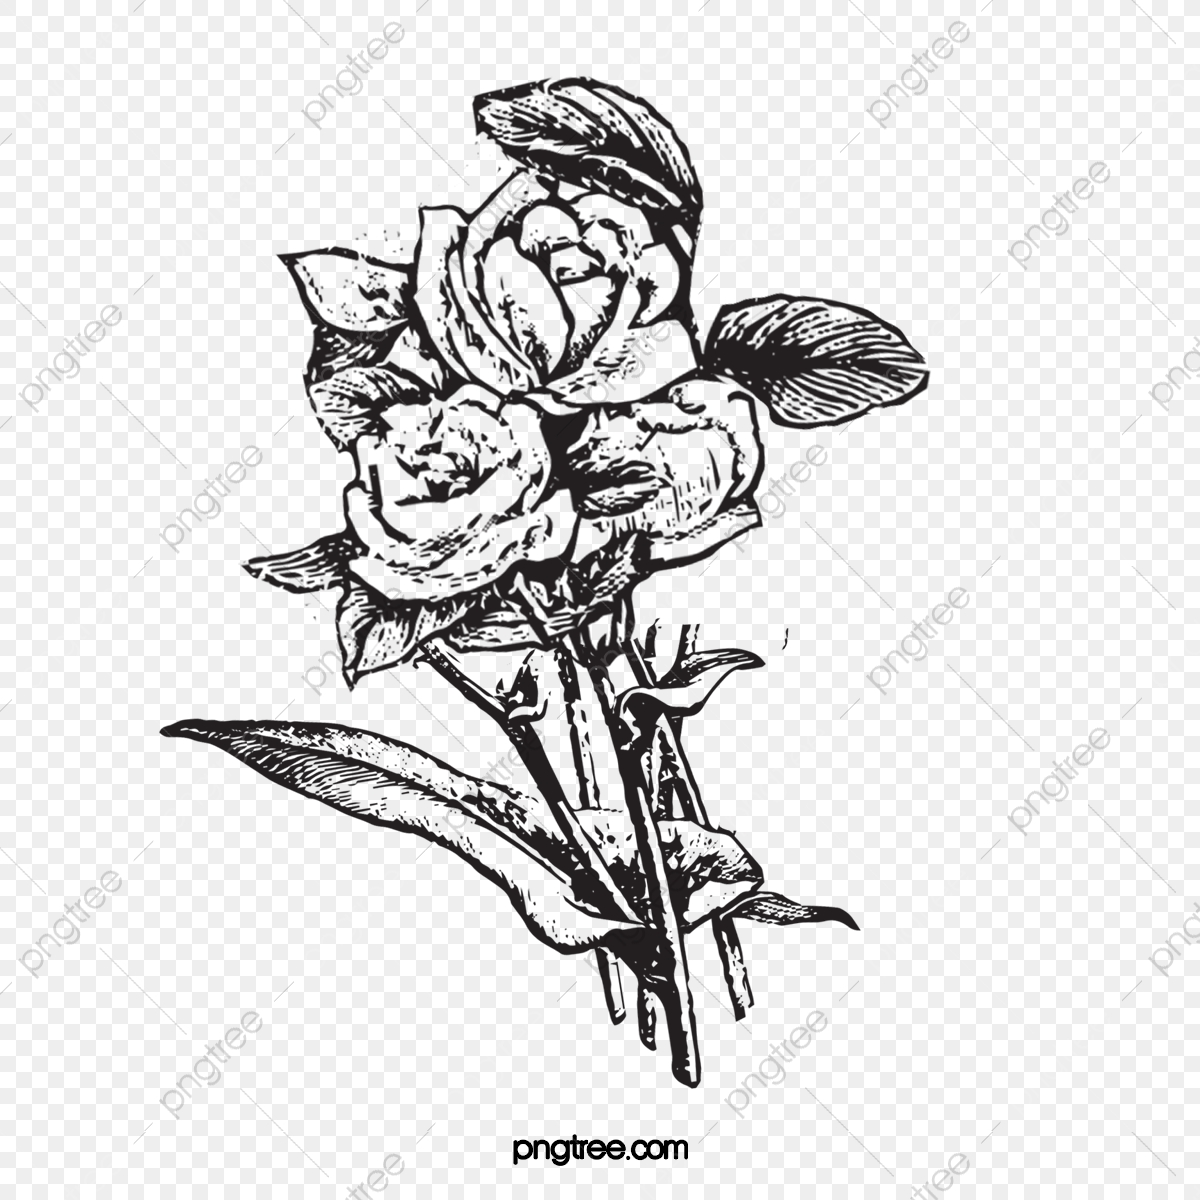 Clipart flower line art - WikiClipArt